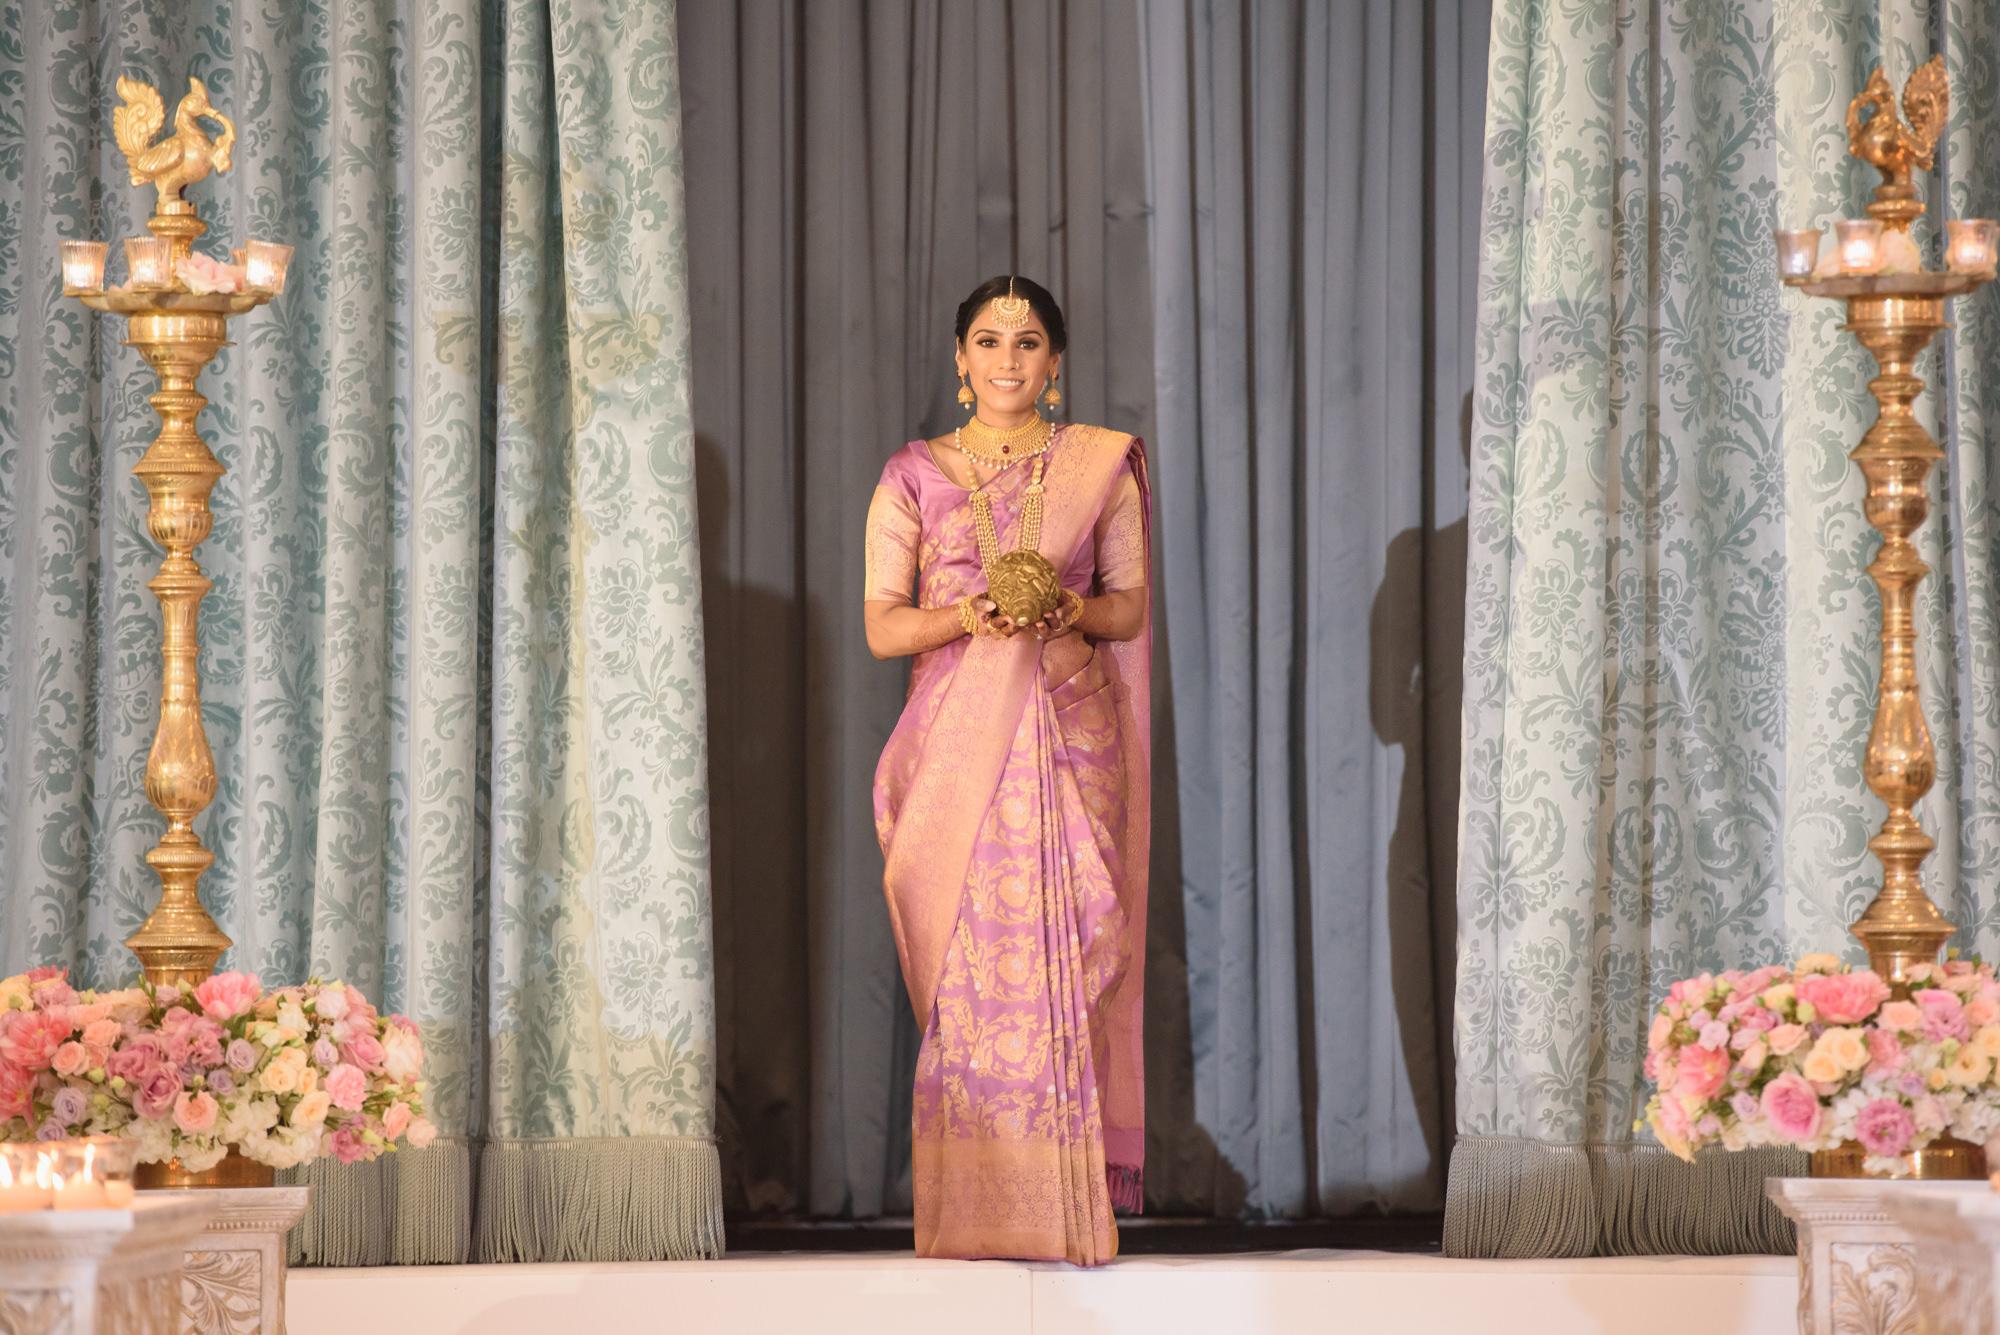 Tamil Gujrati hindu wedding photography photographer london the savoy -37.jpg